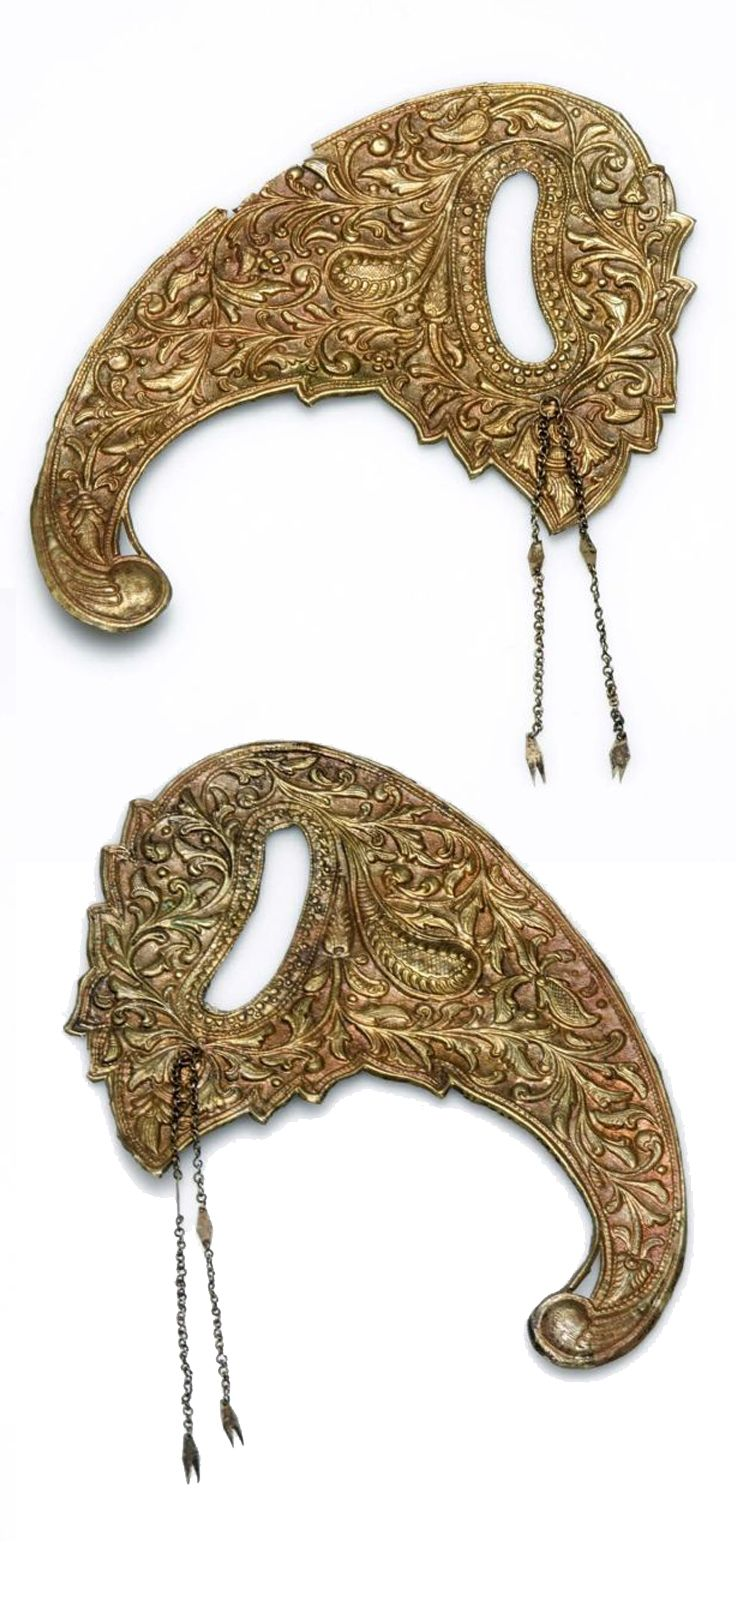 Indonesia ~ Java | Gilded bass headdress ornament | ca. 1970 or earlier